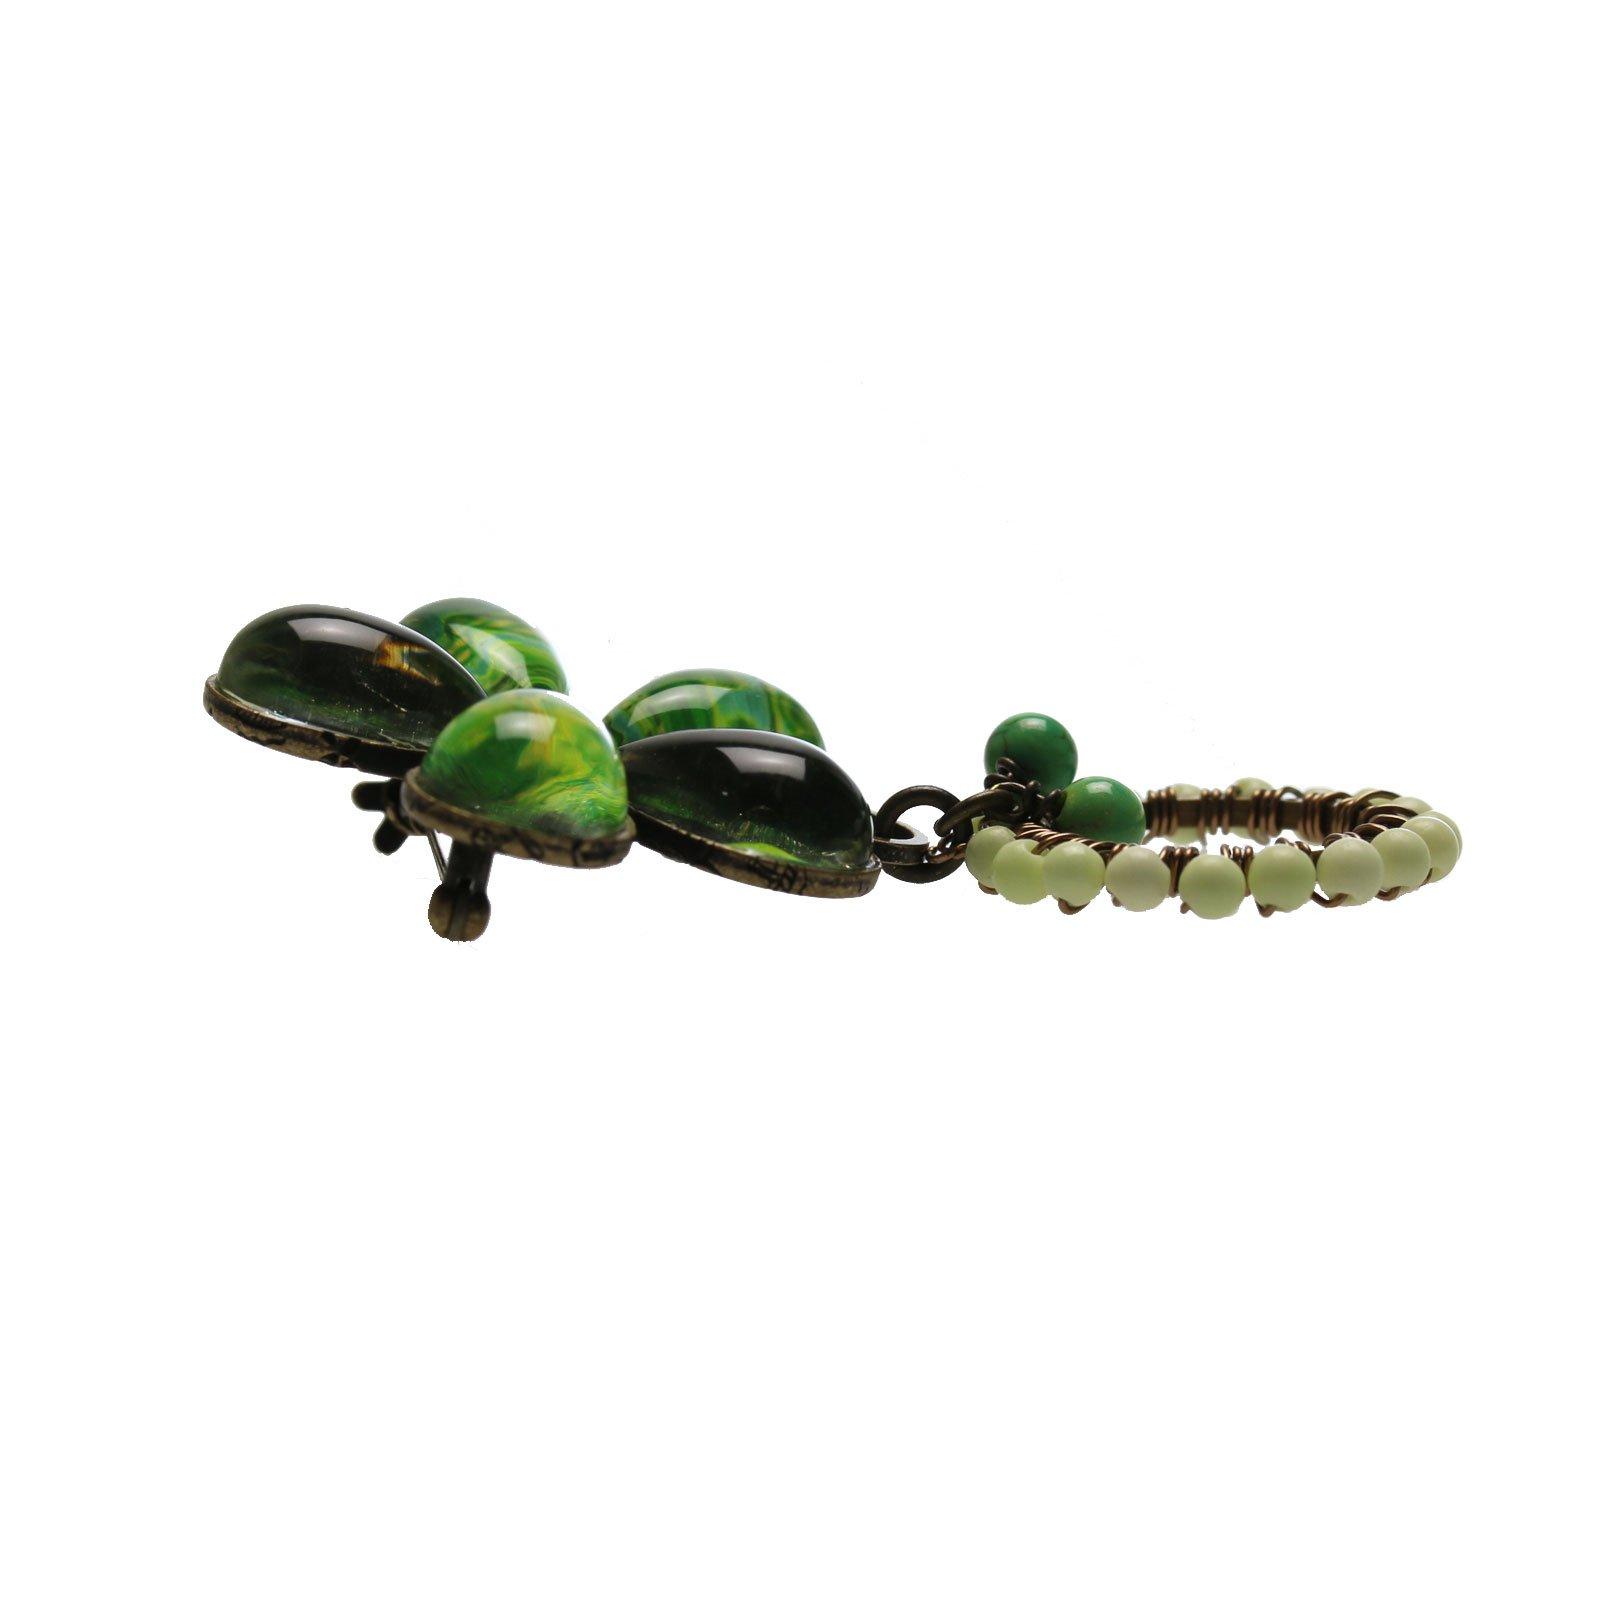 Tamarusan Eyeglass Holder Brooch Flower Lily Green Lemon Chrysoprease Turquoise by TAMARUSAN (Image #2)